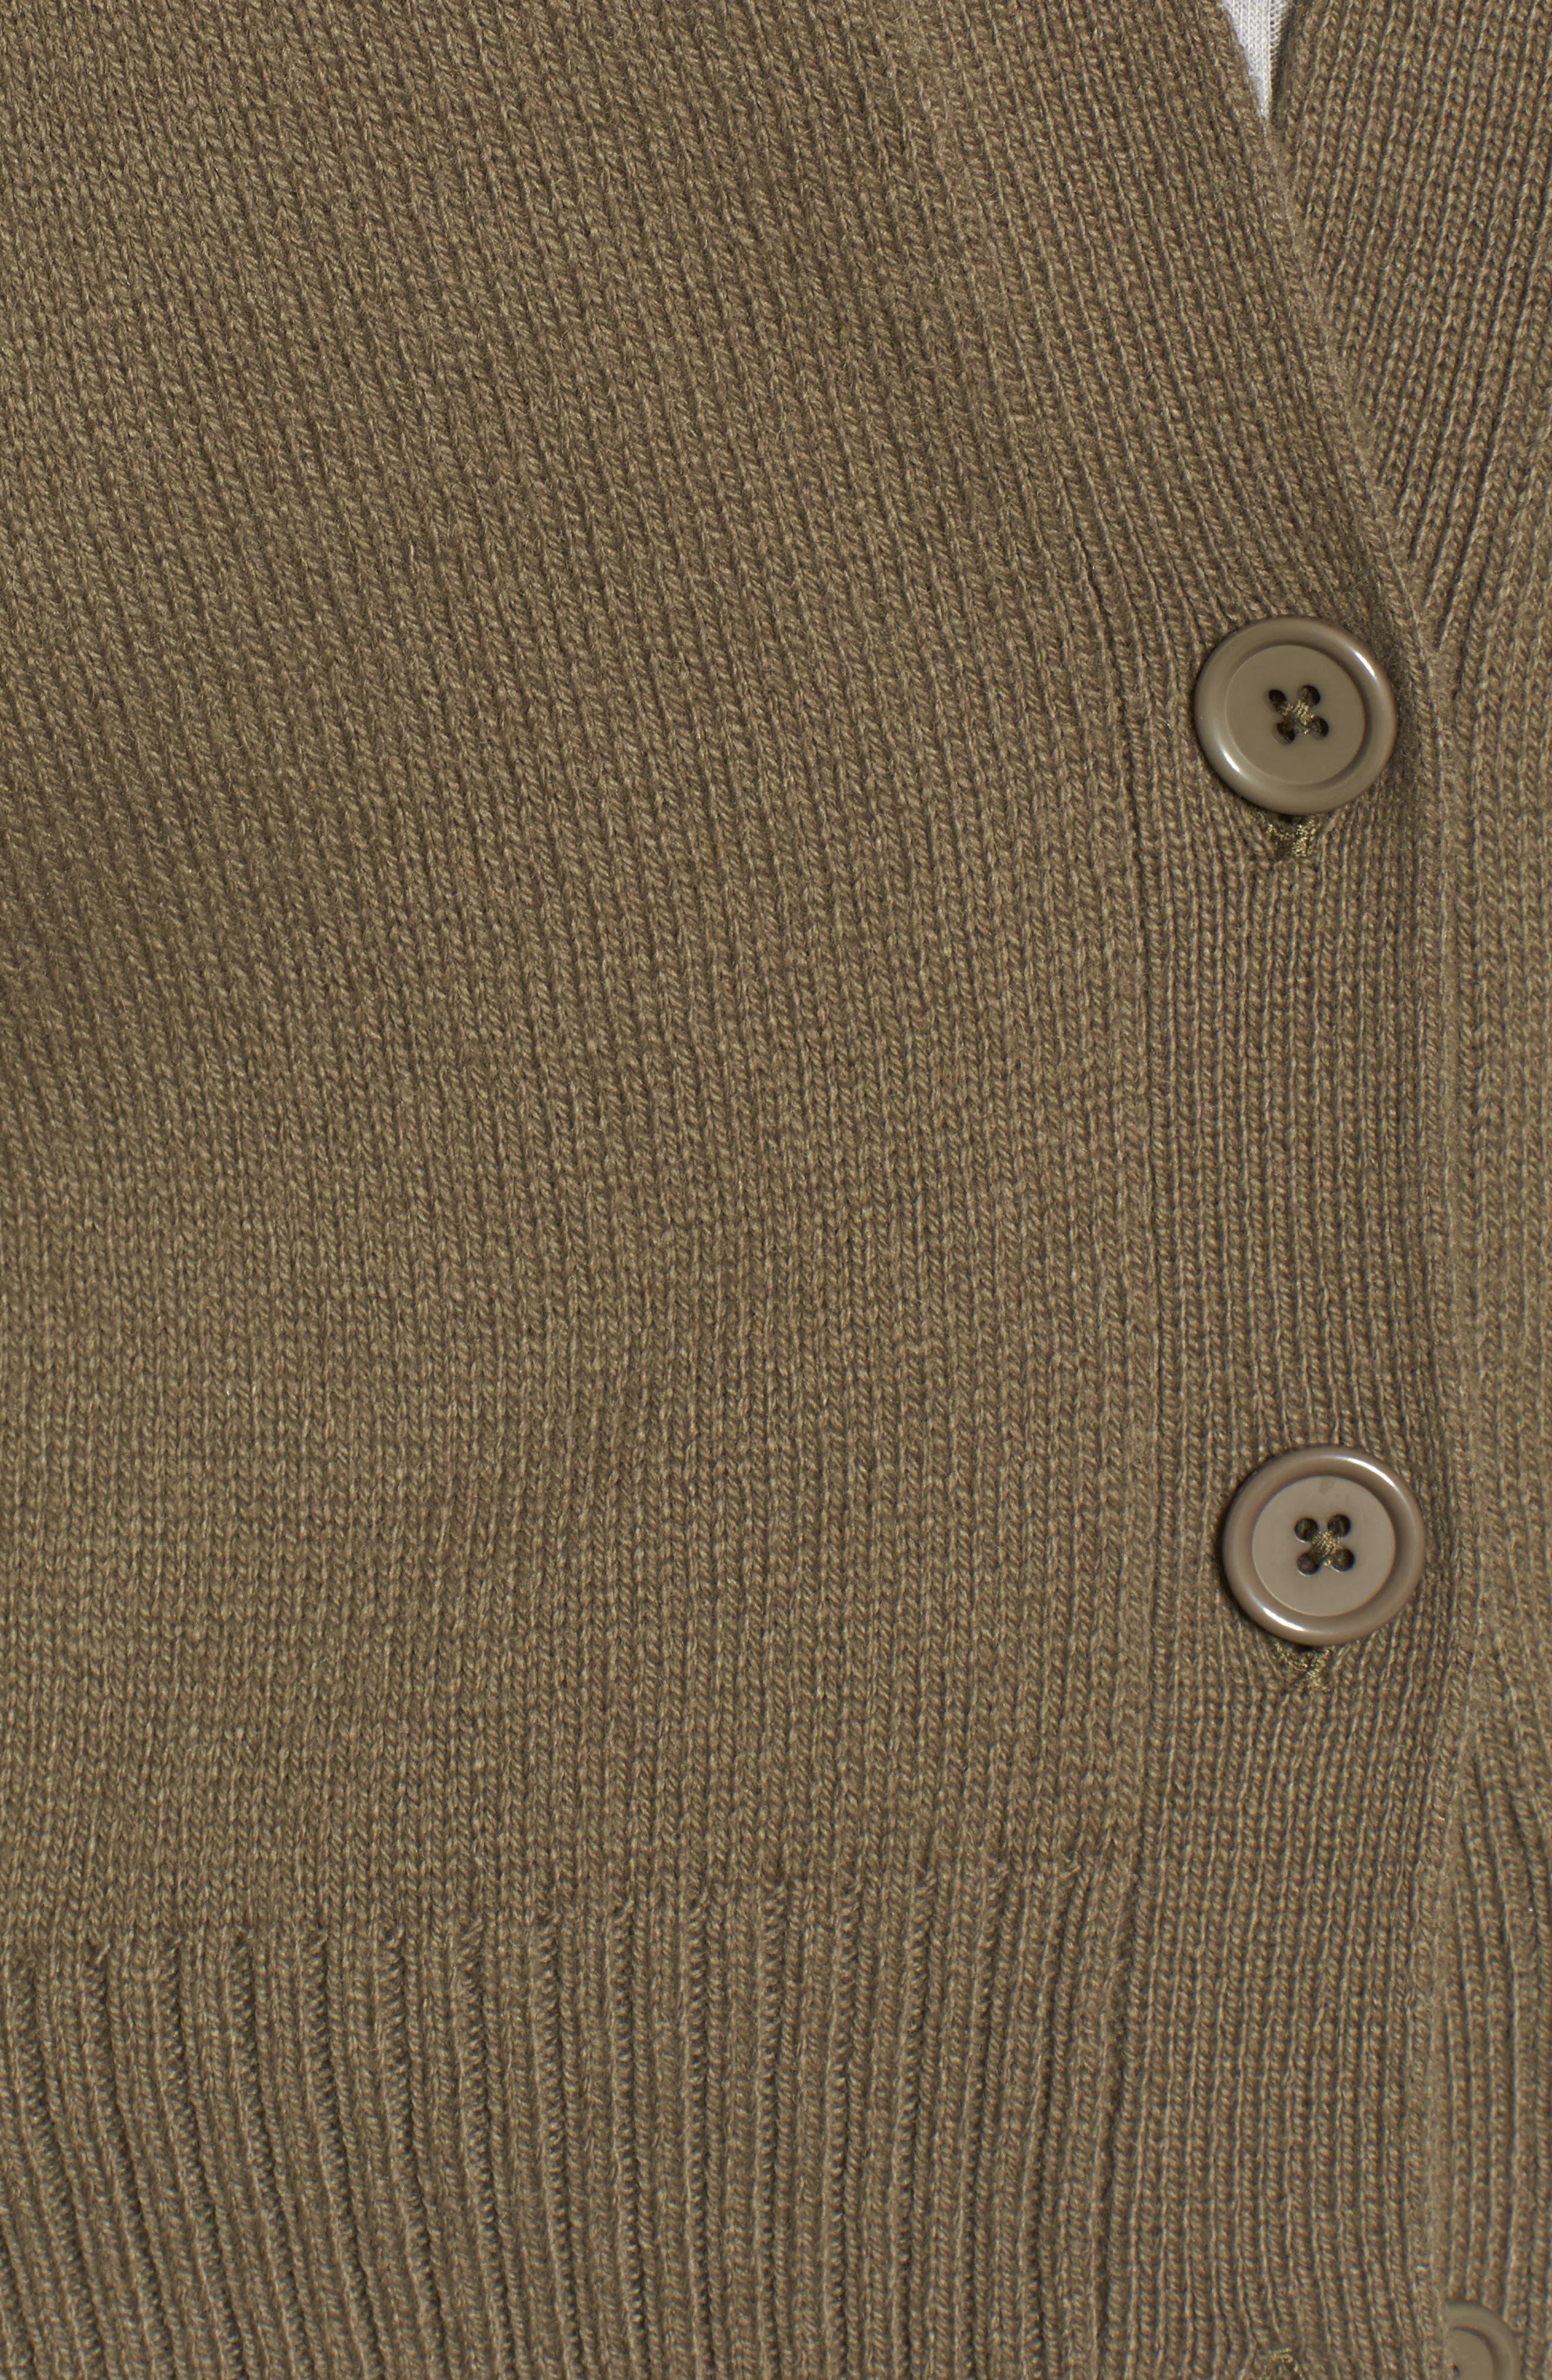 Bow Sleeve Cardigan,                             Alternate thumbnail 5, color,                             Olive Grove